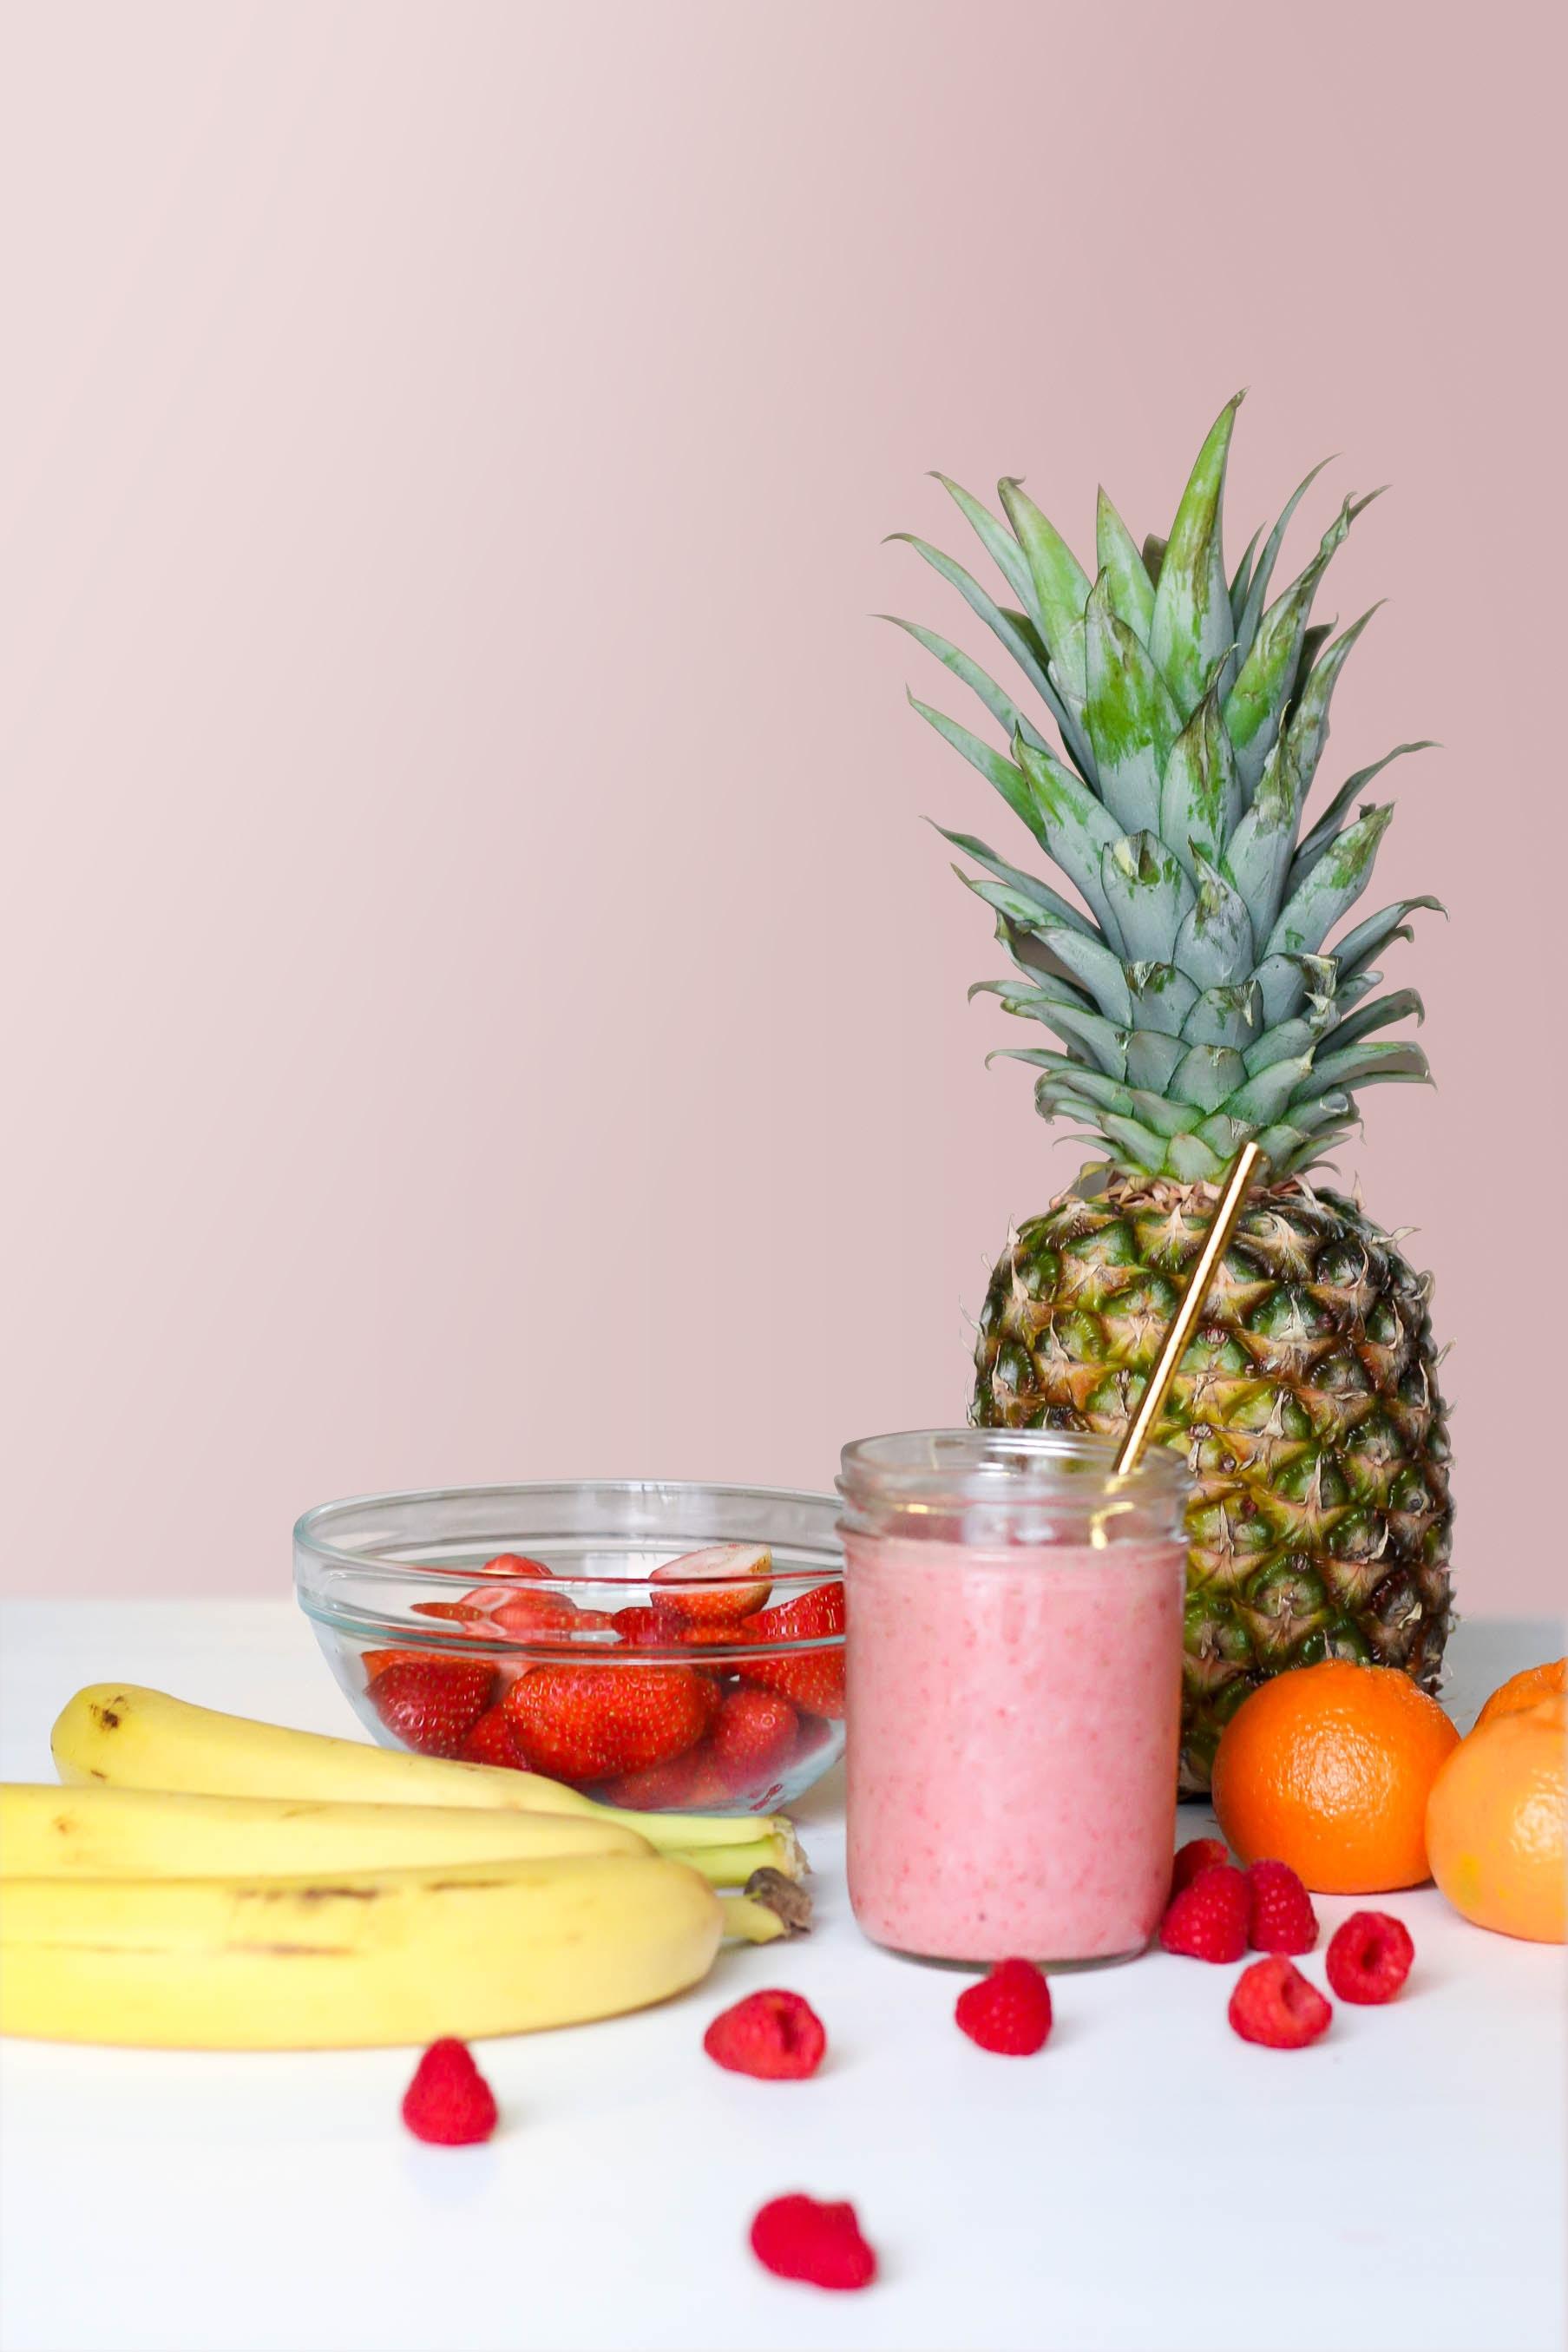 fiber-rich diet